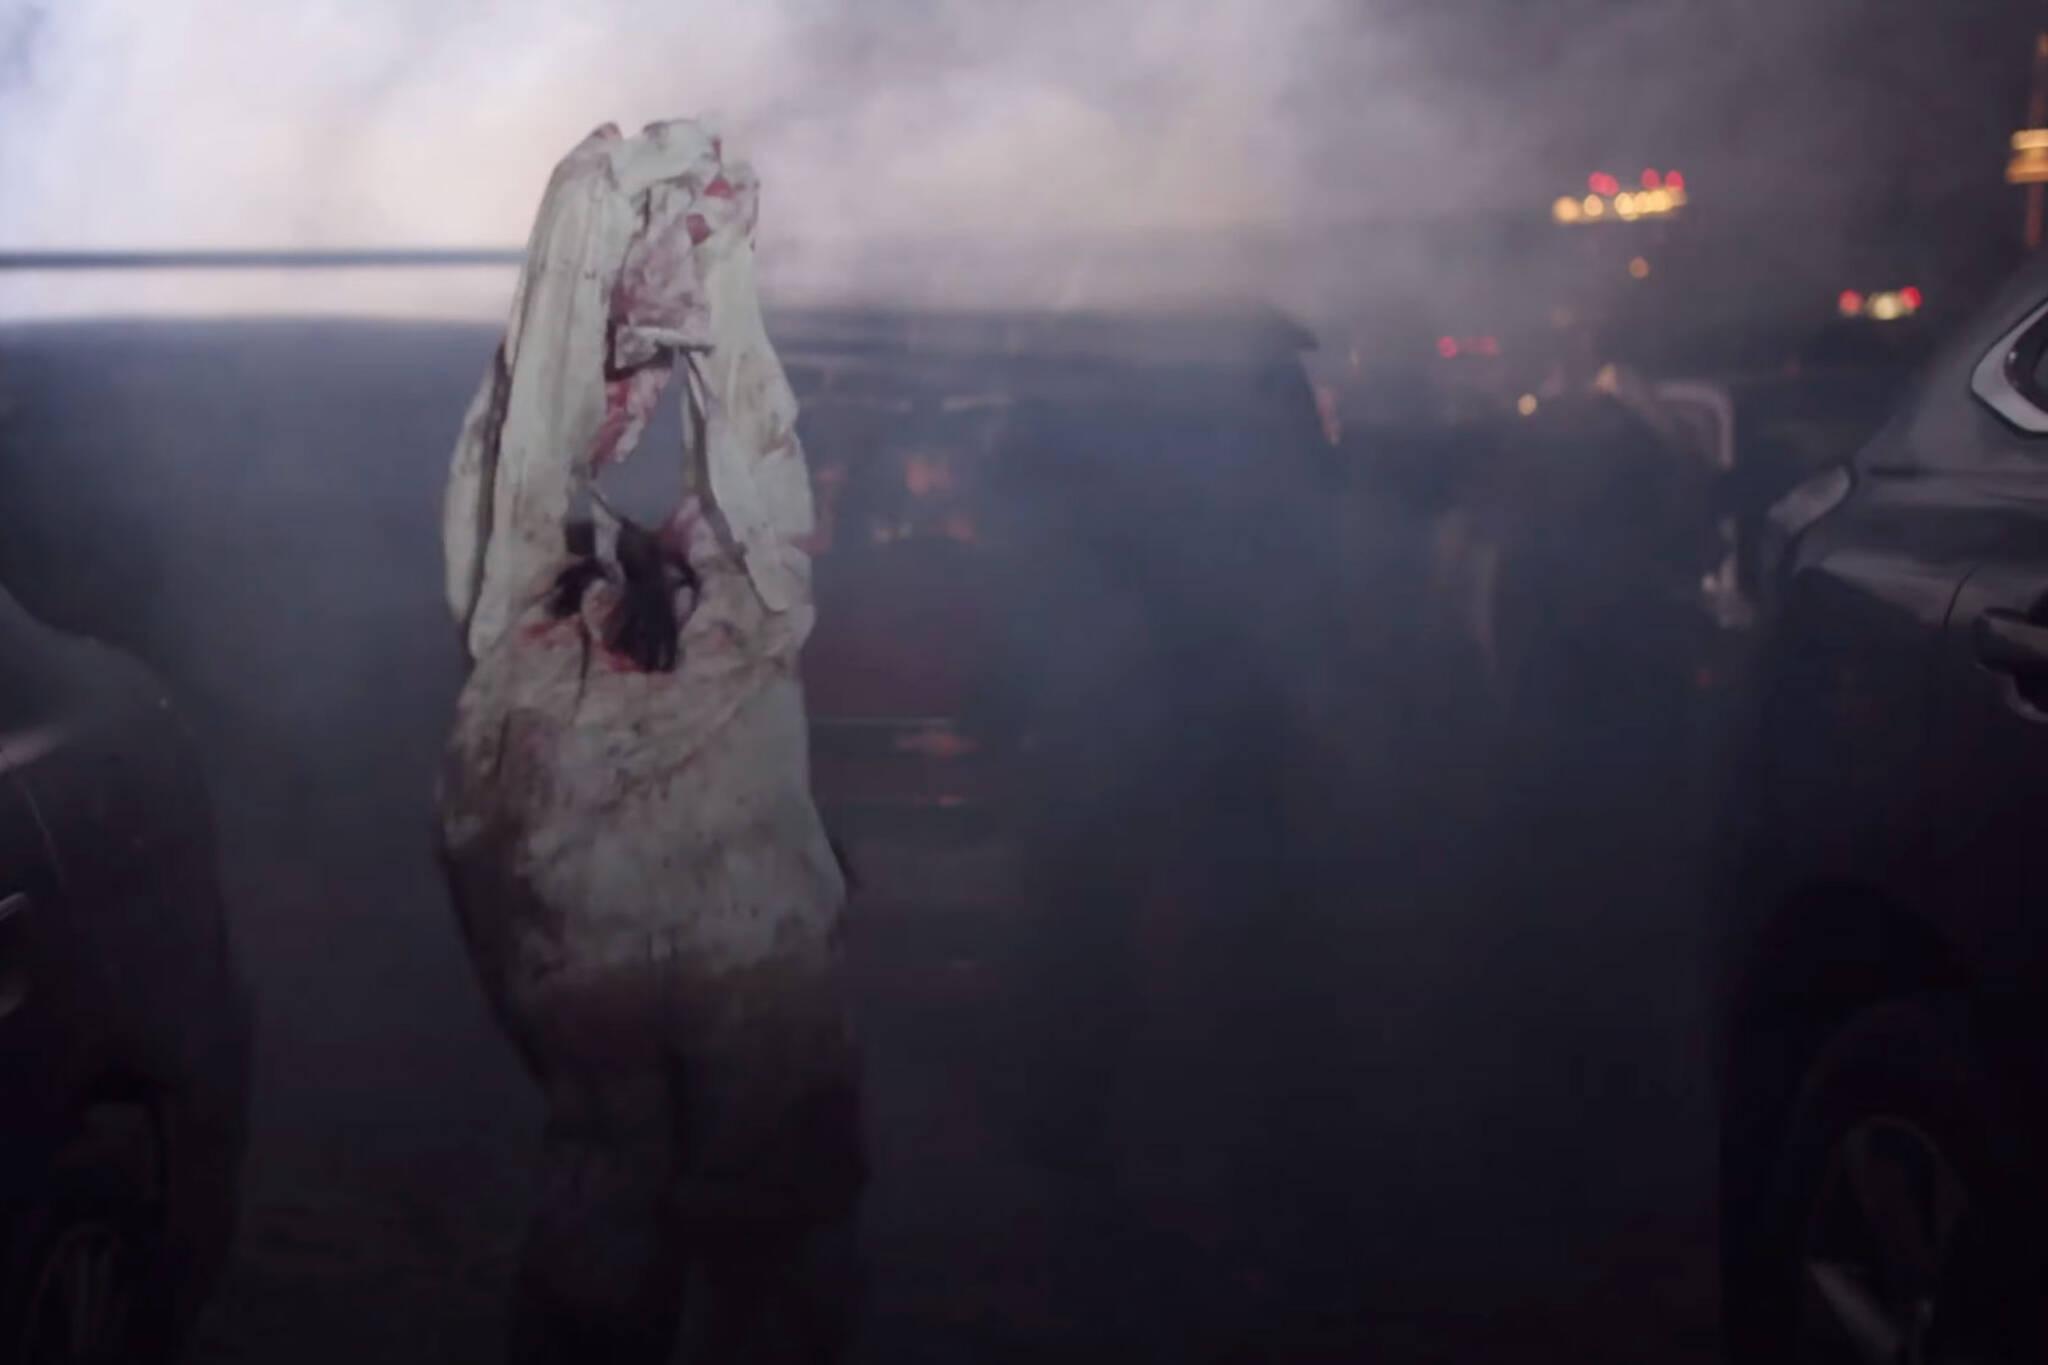 haunted cinema toronto 2021